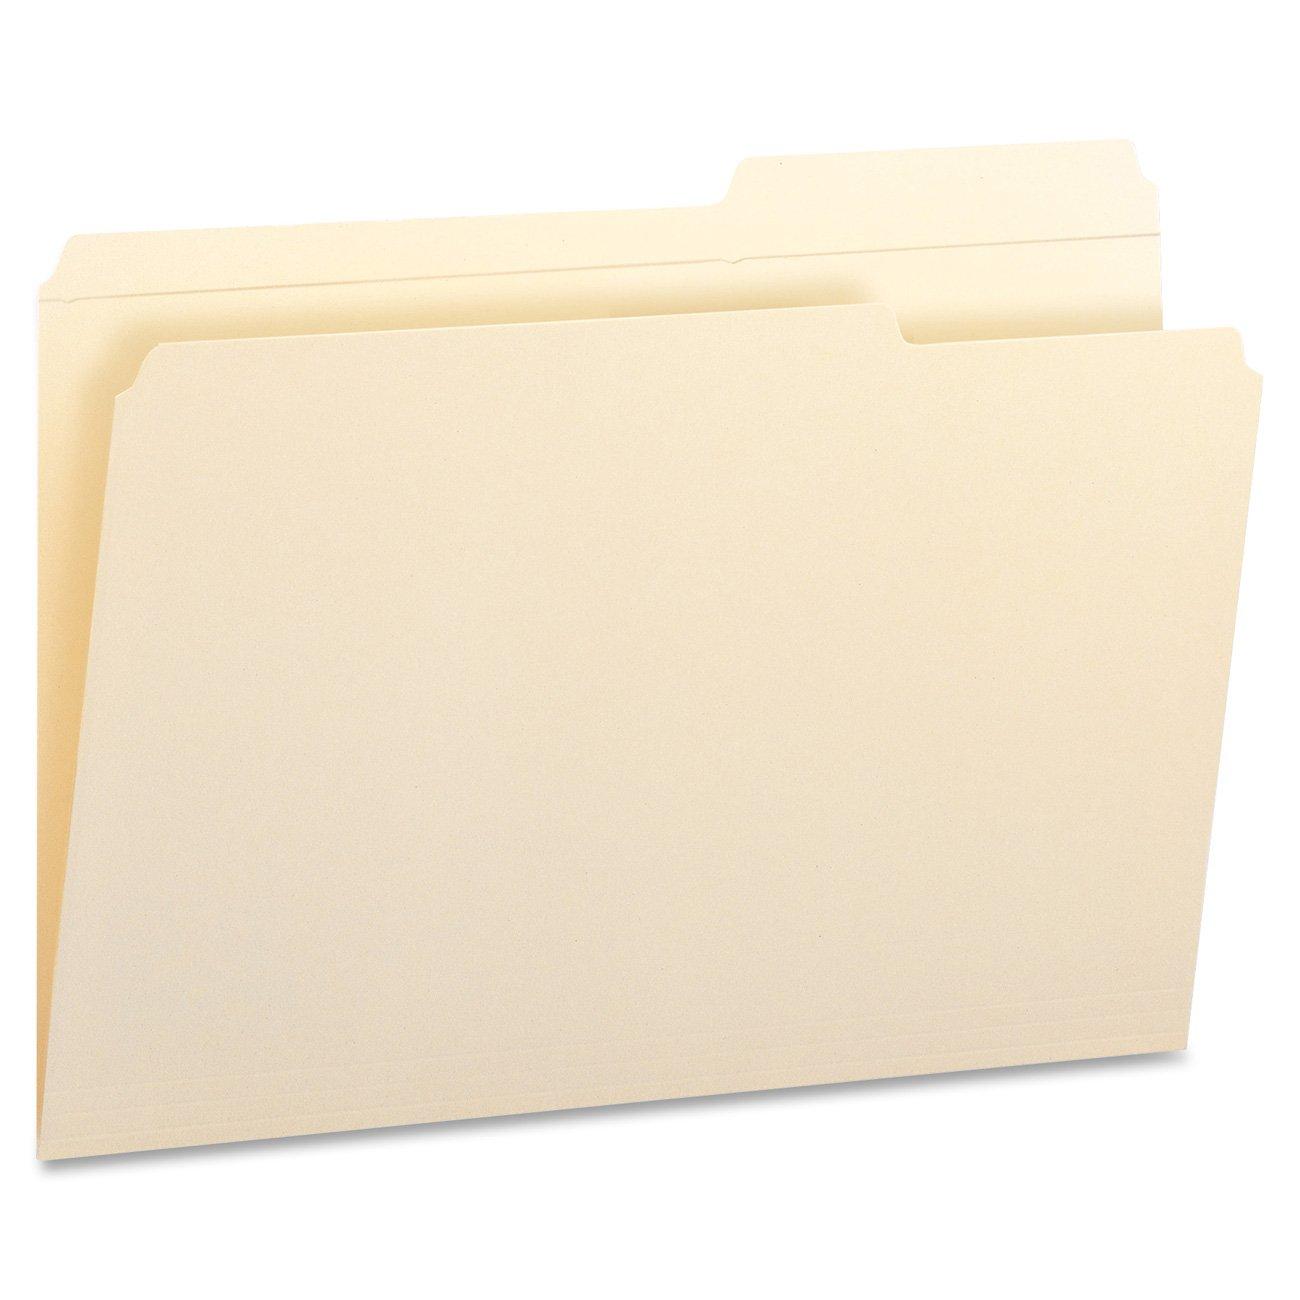 Guide Height Folder, 2/5 Cut Right, Reinforced Top Tab, Legal, Manila, 100/Box (並行輸入品) B0006HUZMU 2/5-Cut Right Position Legal Legal 2/5-Cut Right Position